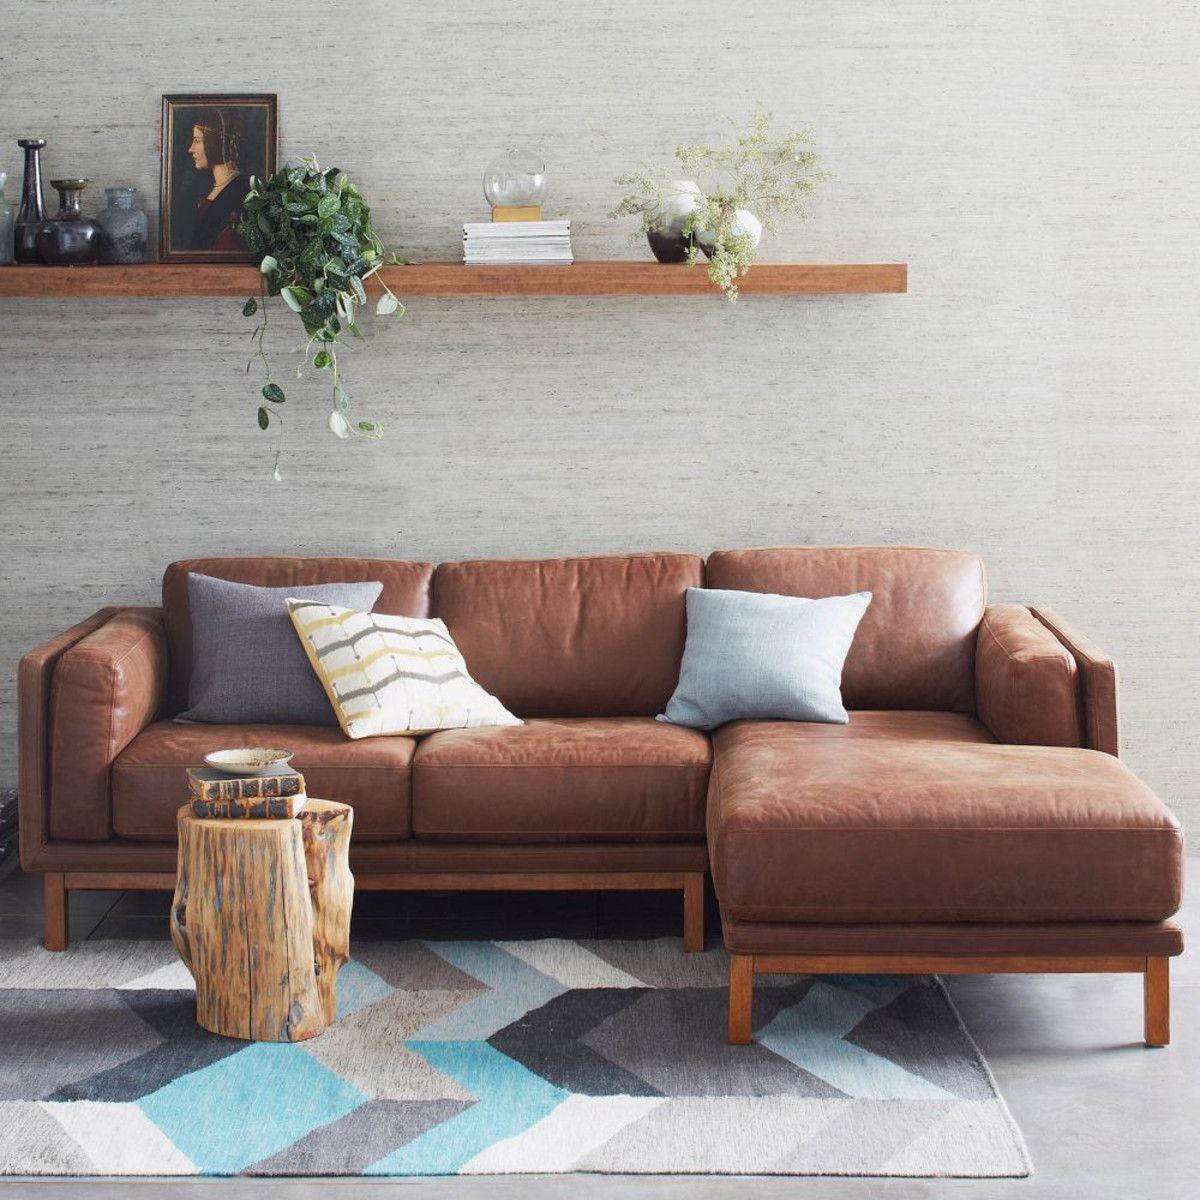 Cool Dekalb 2 Piece Premium Leather Sectional West Elm Theyellowbook Wood Chair Design Ideas Theyellowbookinfo